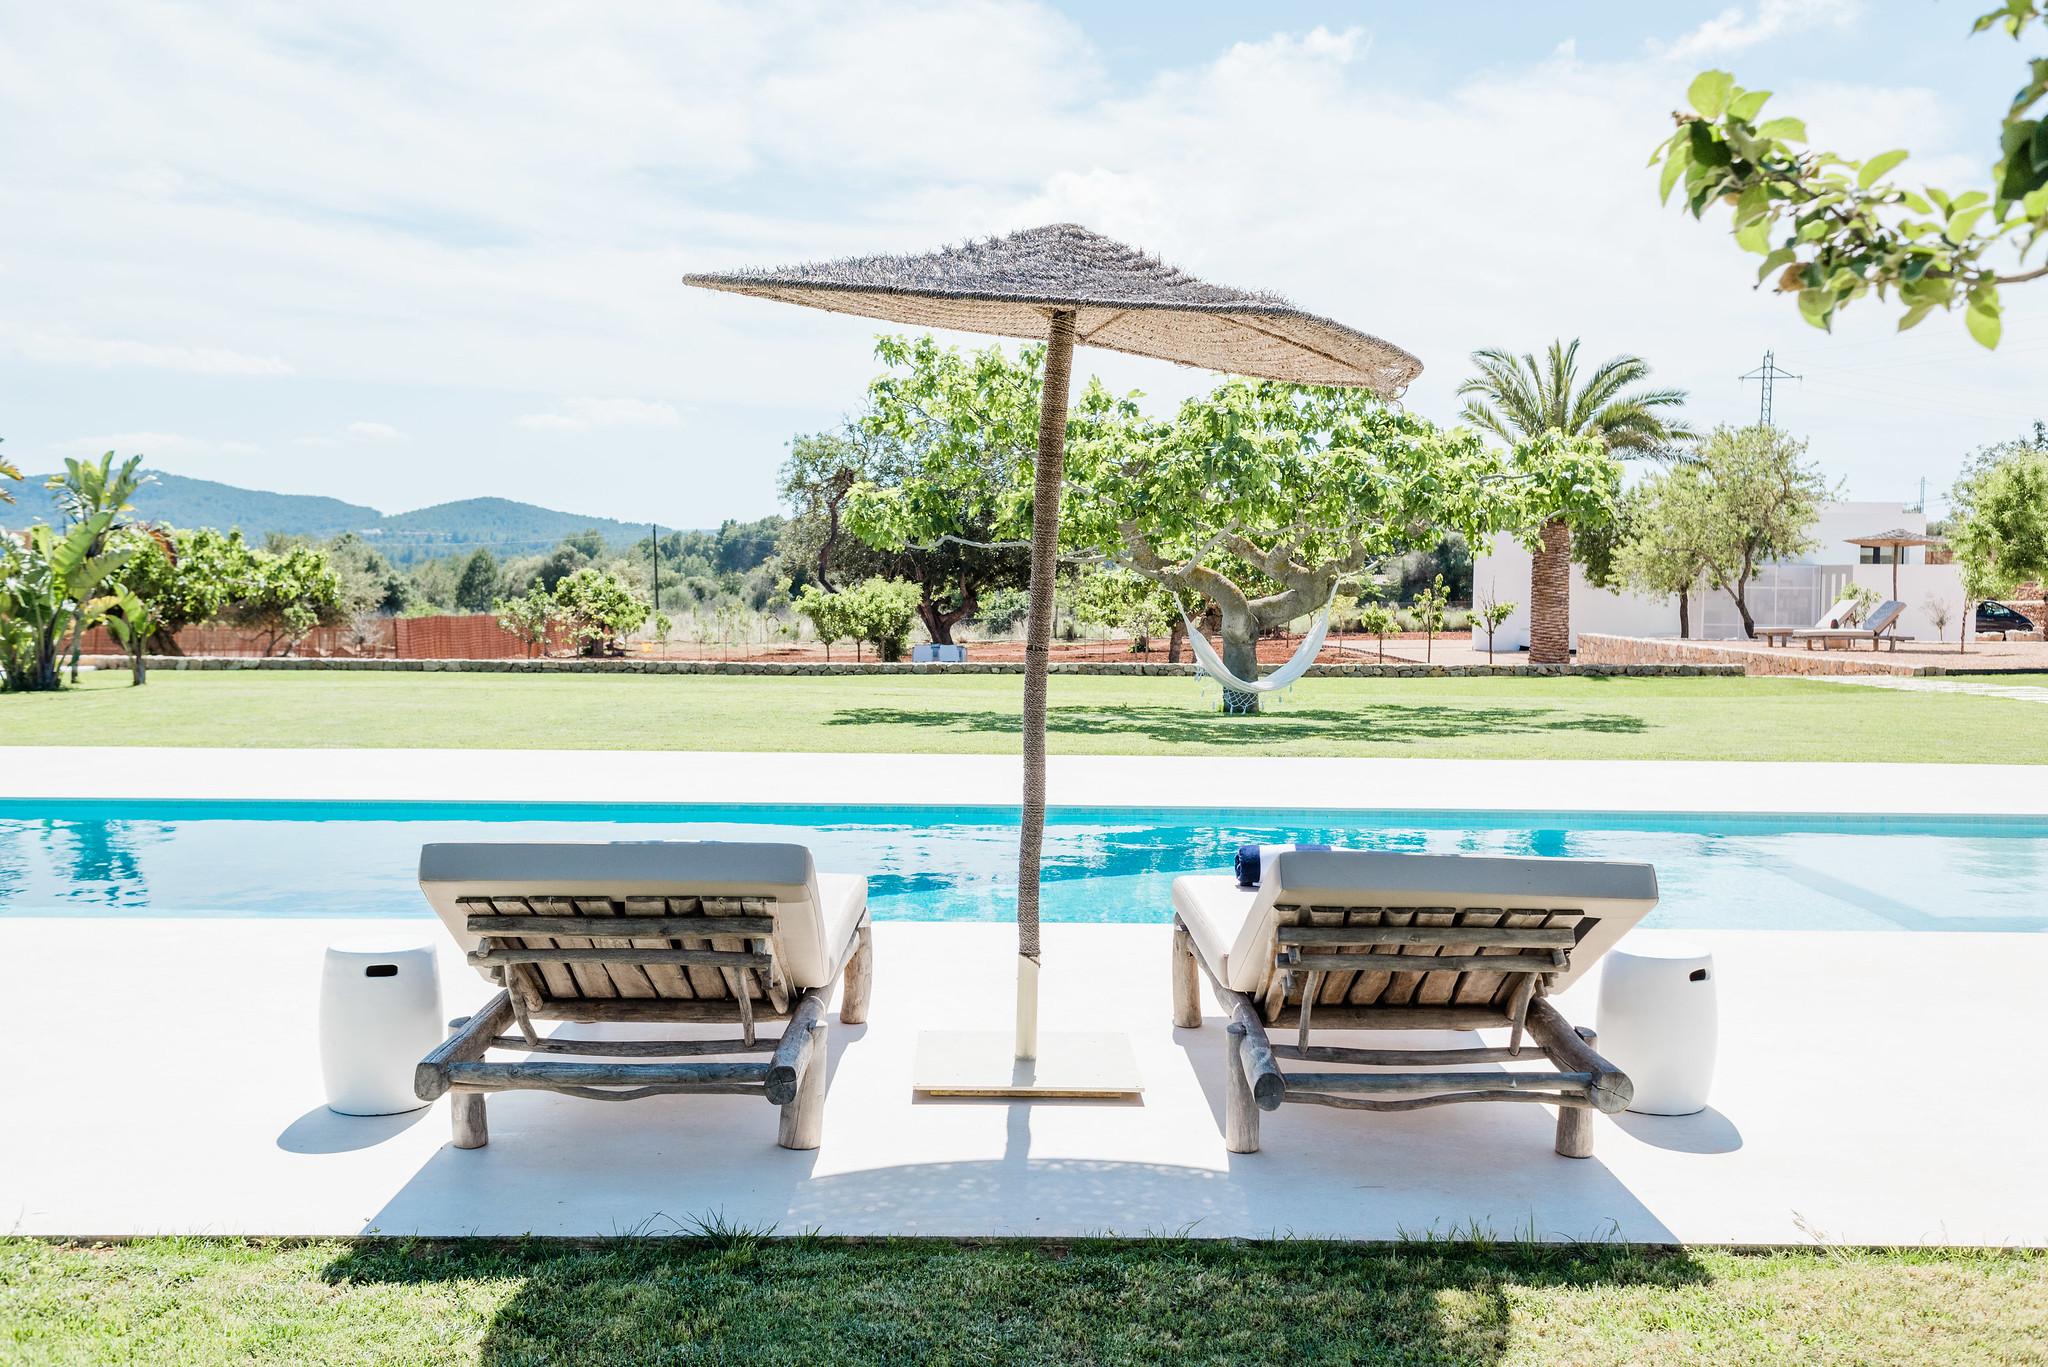 https://www.white-ibiza.com/wp-content/uploads/2020/06/white-ibiza-villas-can-carmen-exterior-pool2.jpg